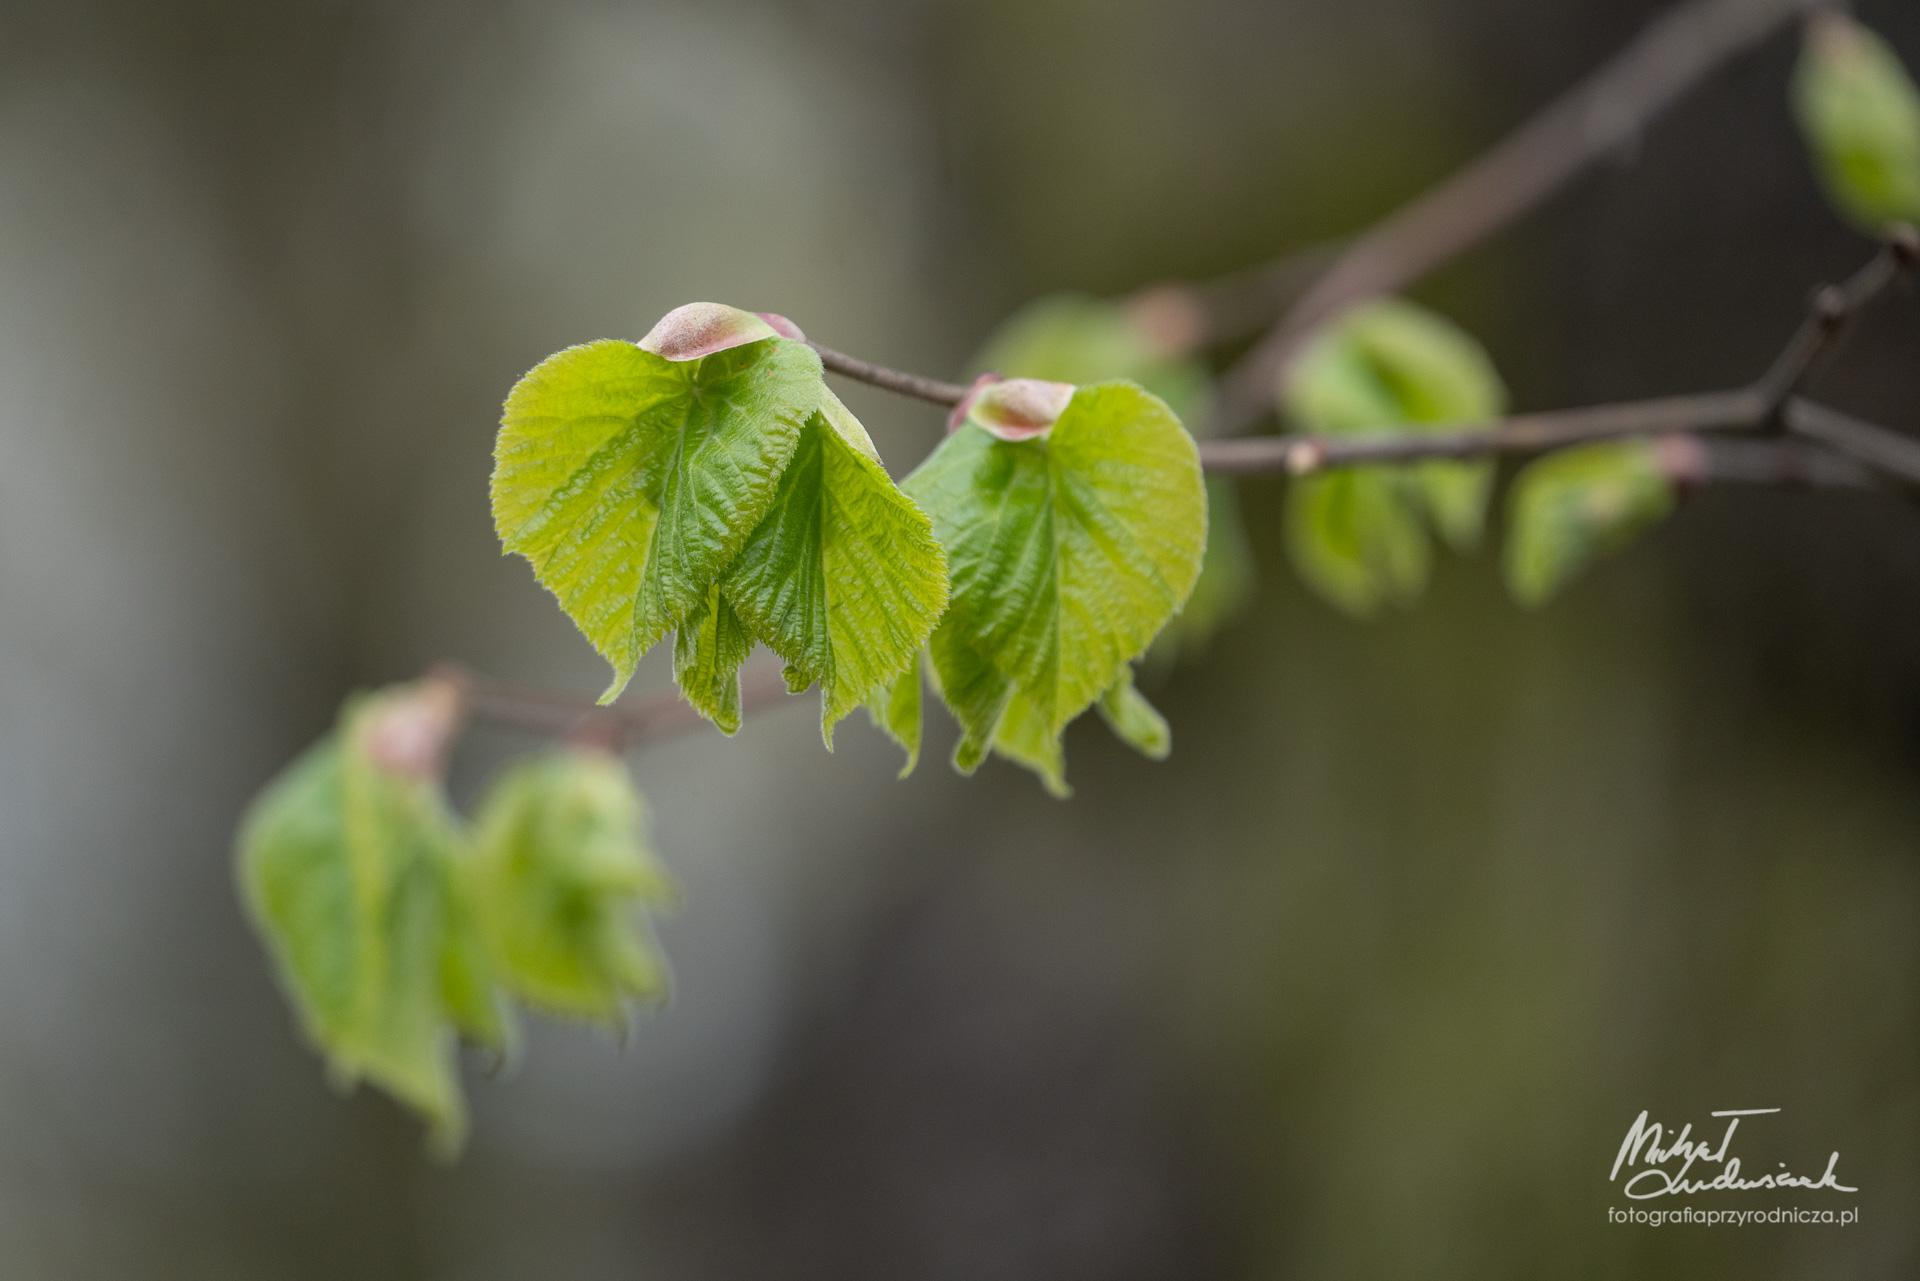 Młode liście lipy